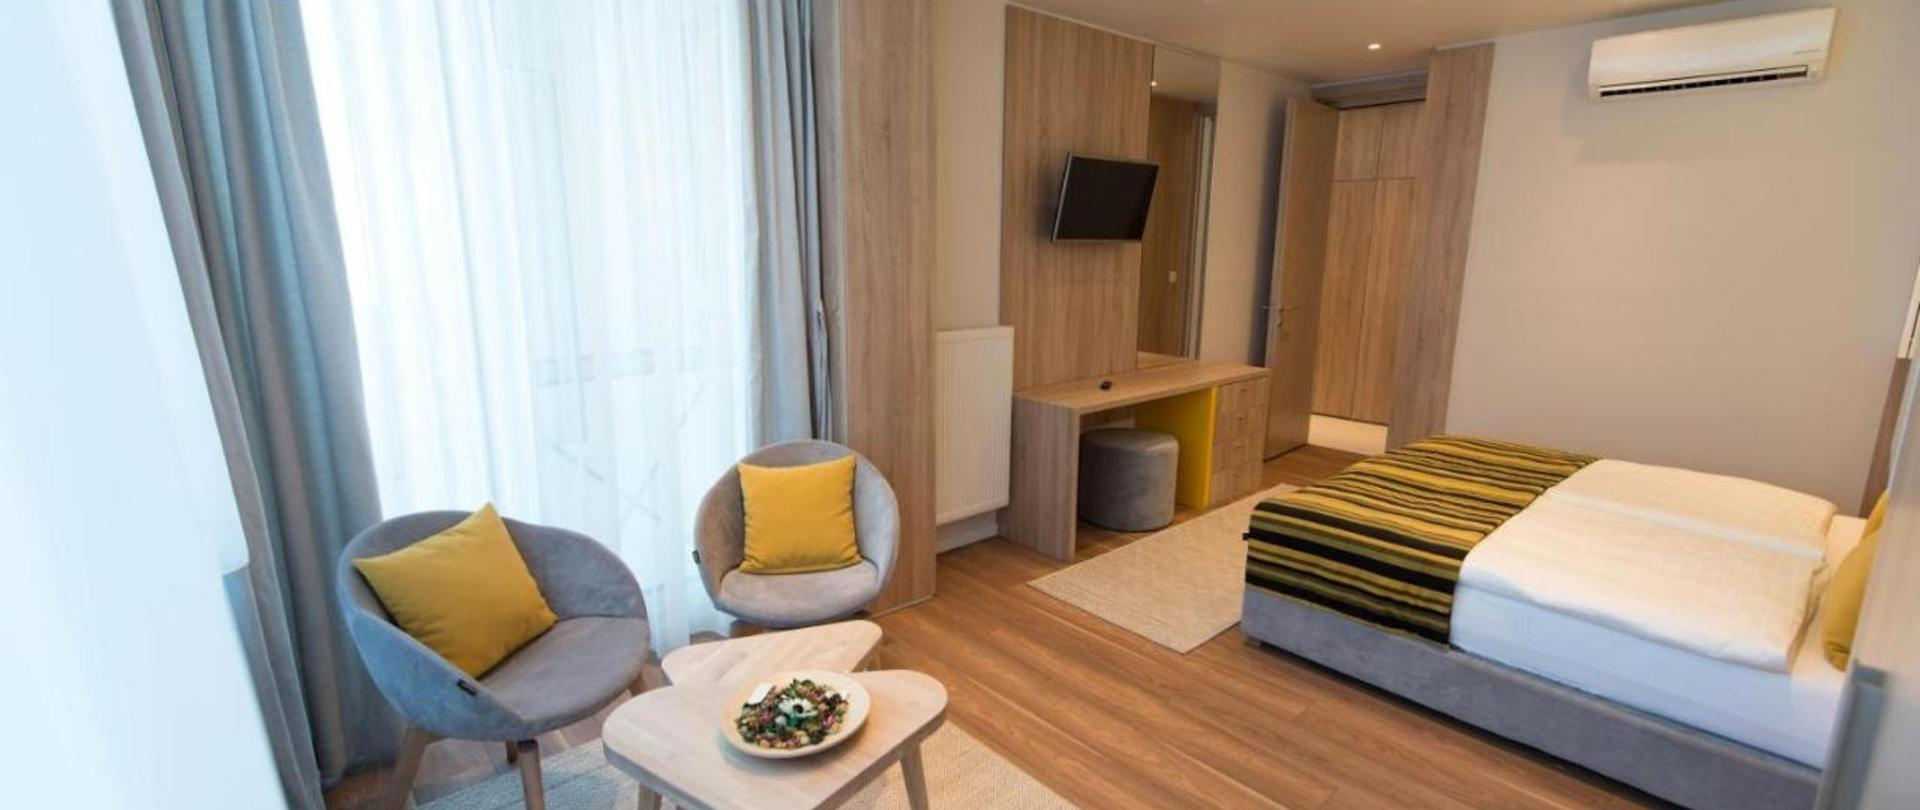 Sarajevo Daily Apartments